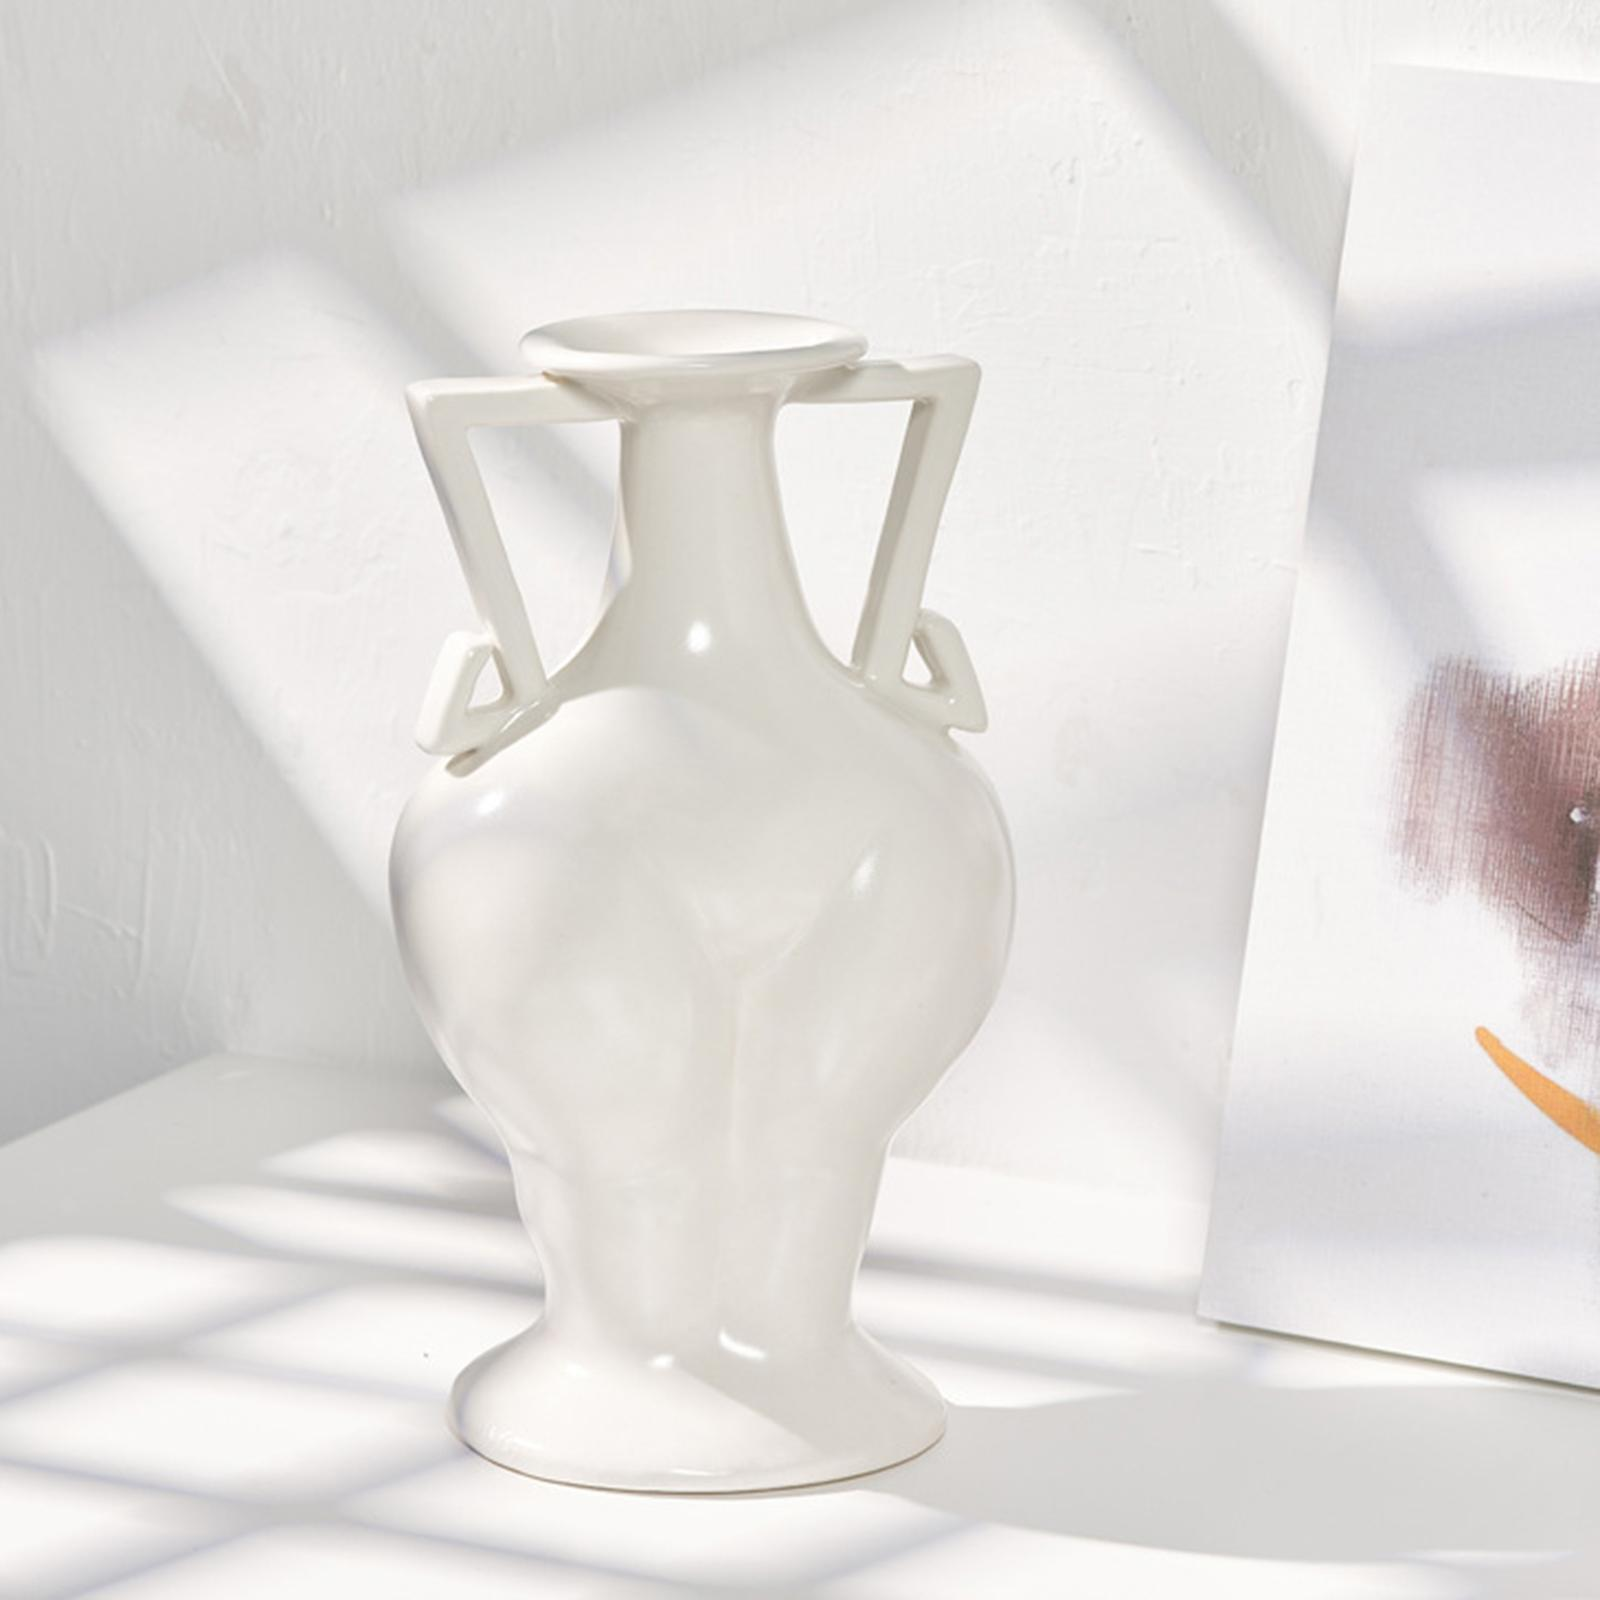 Indexbild 22 - Blumenvase Keramik Blumentöpfe Trockenblumenhalter Pflanzenvasen Wohnkultur